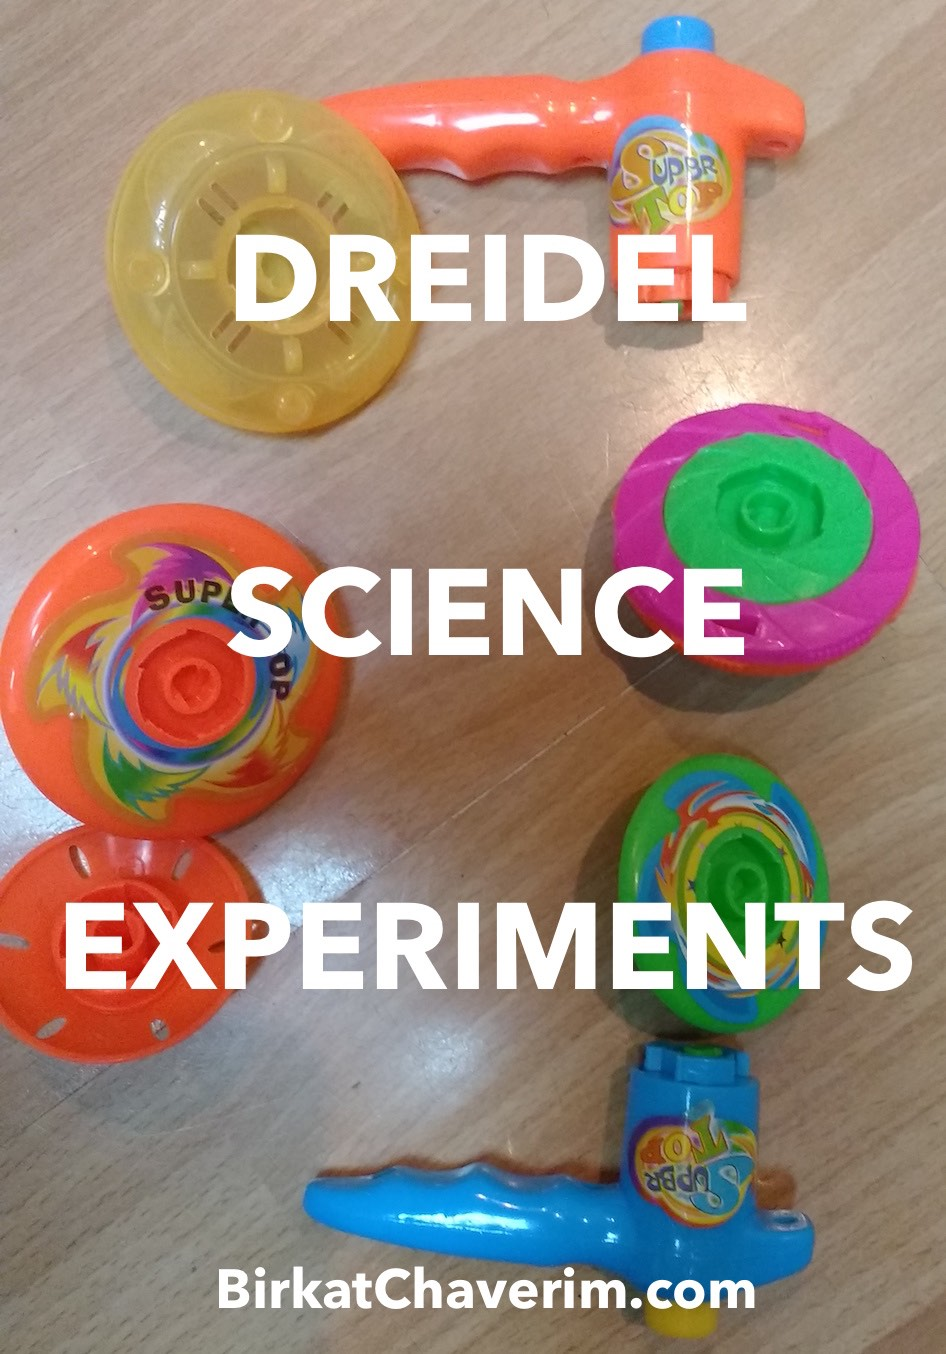 Dreidel Science Experiments via Birkat Chaverim